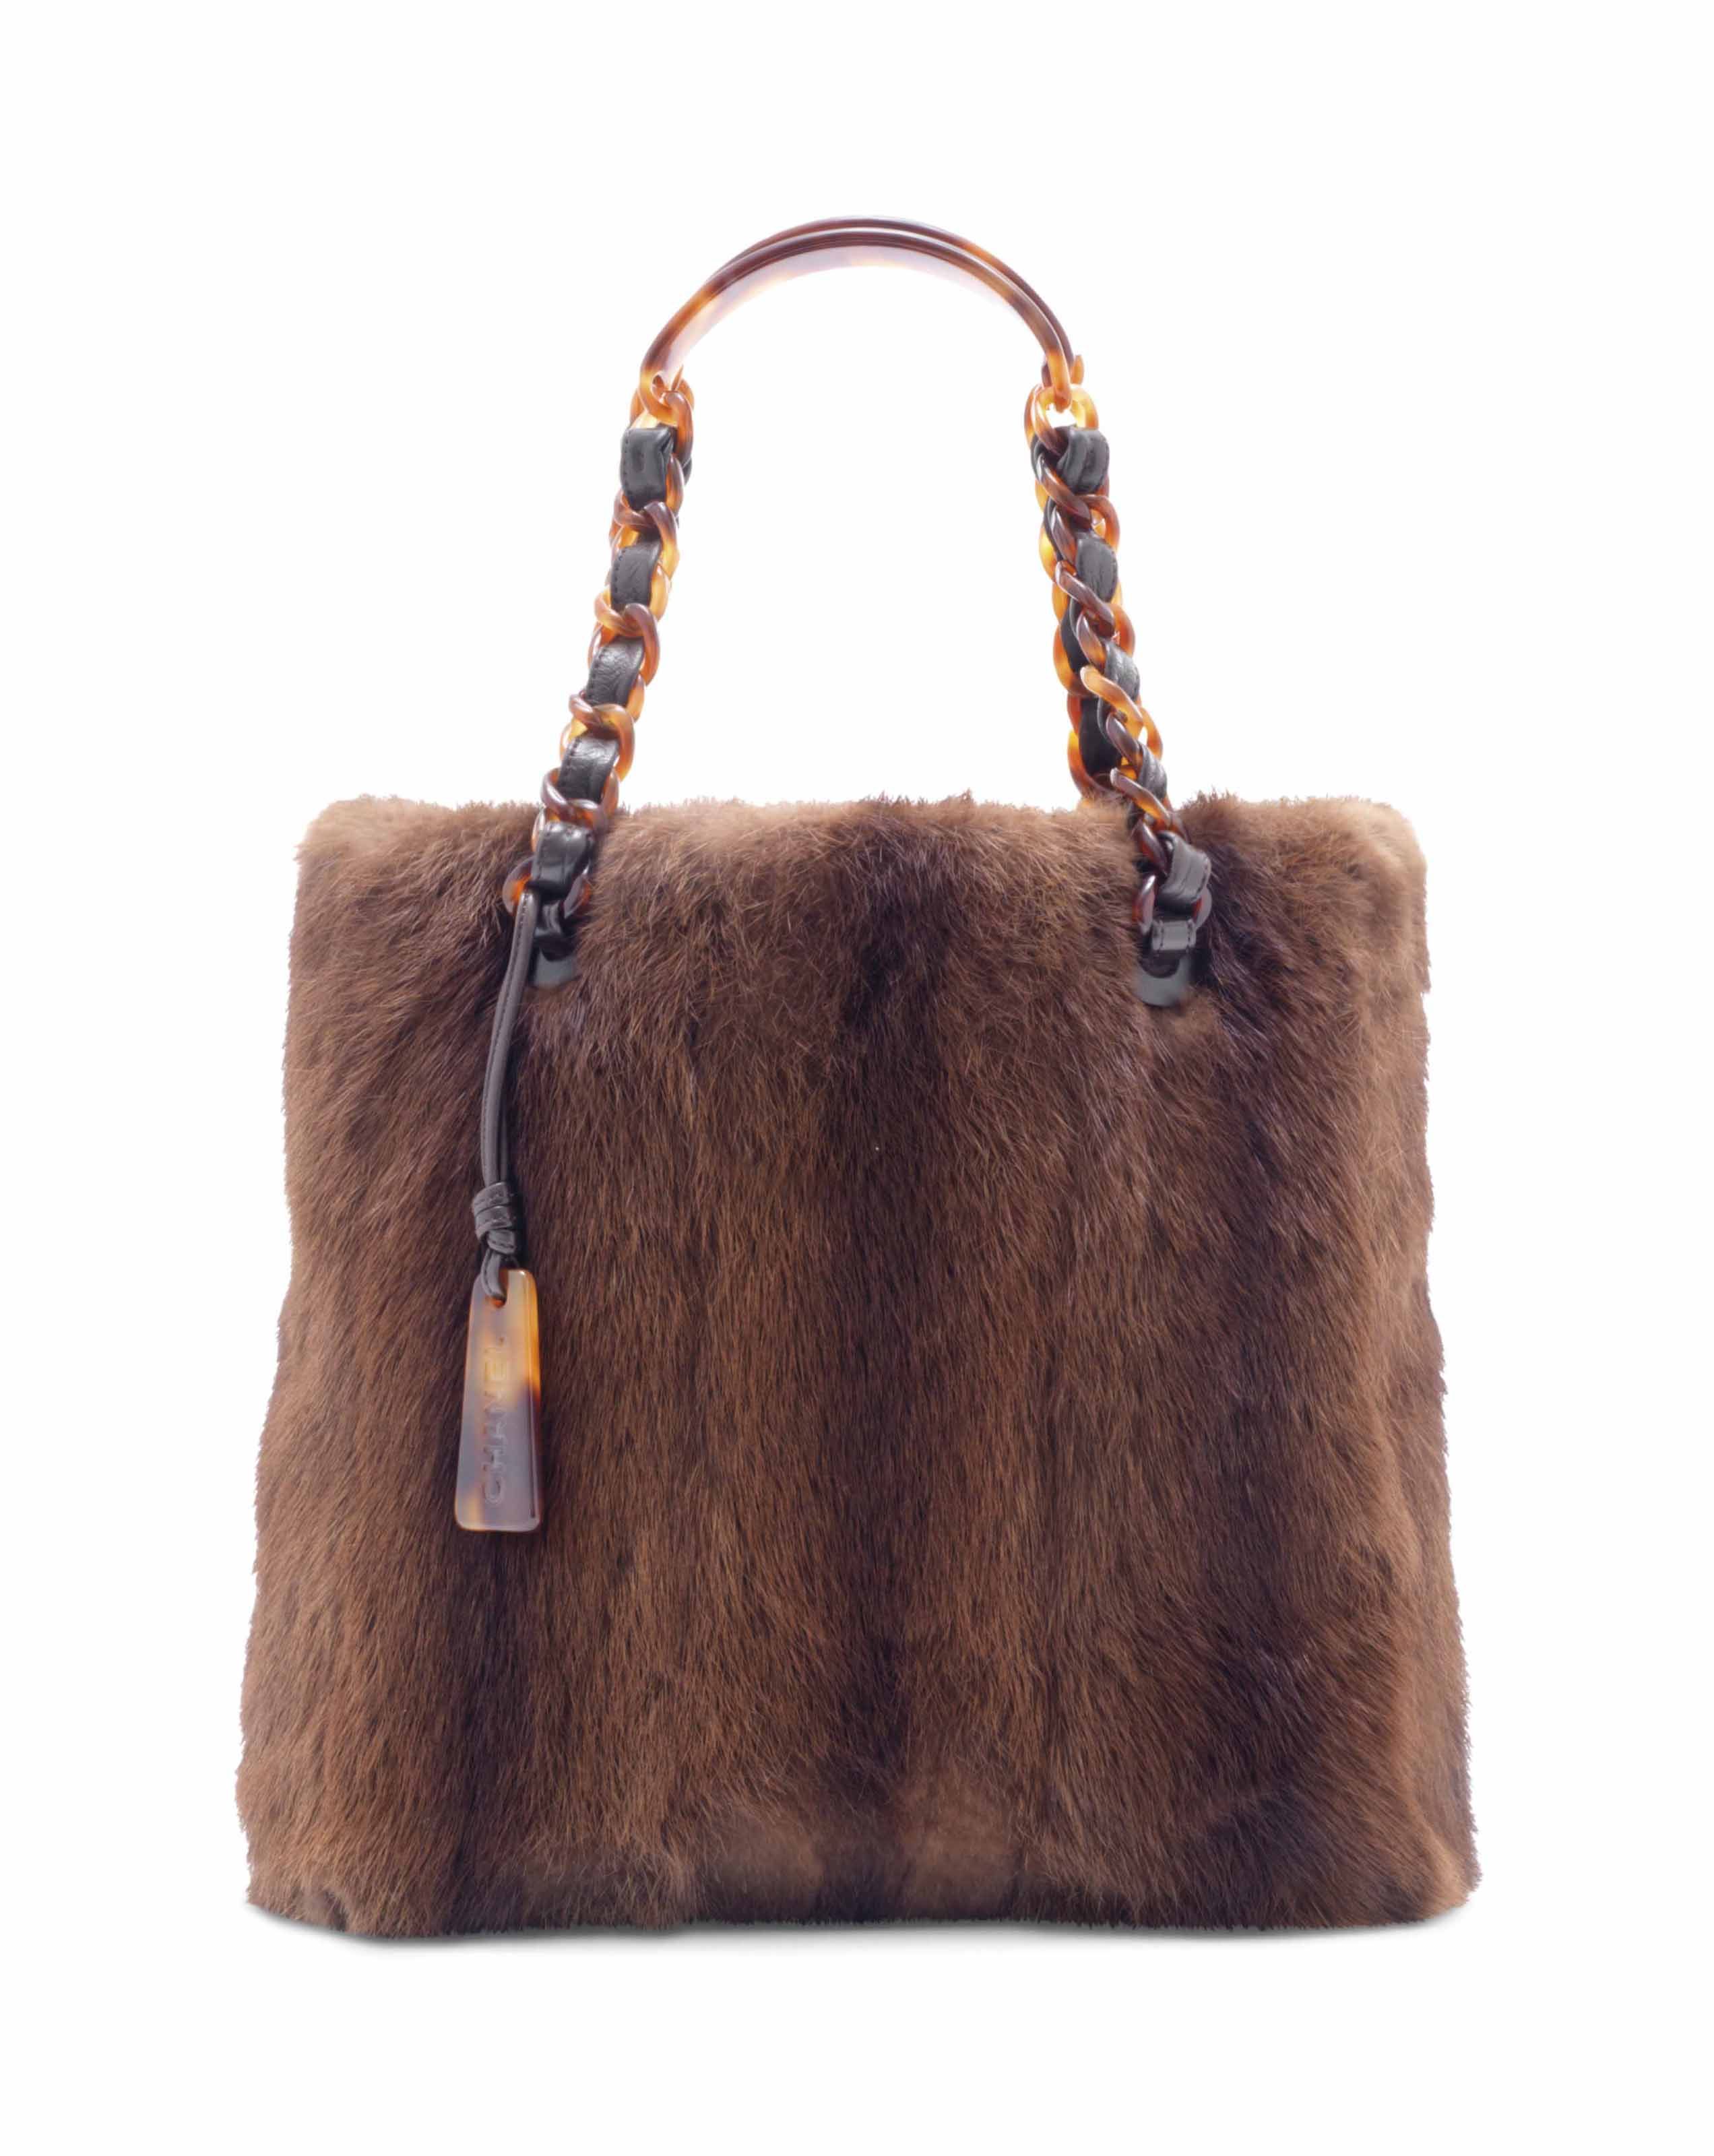 chanel 2017 handbags. sac shopping en vison marron, garniture enchanel chanel 2017 handbags